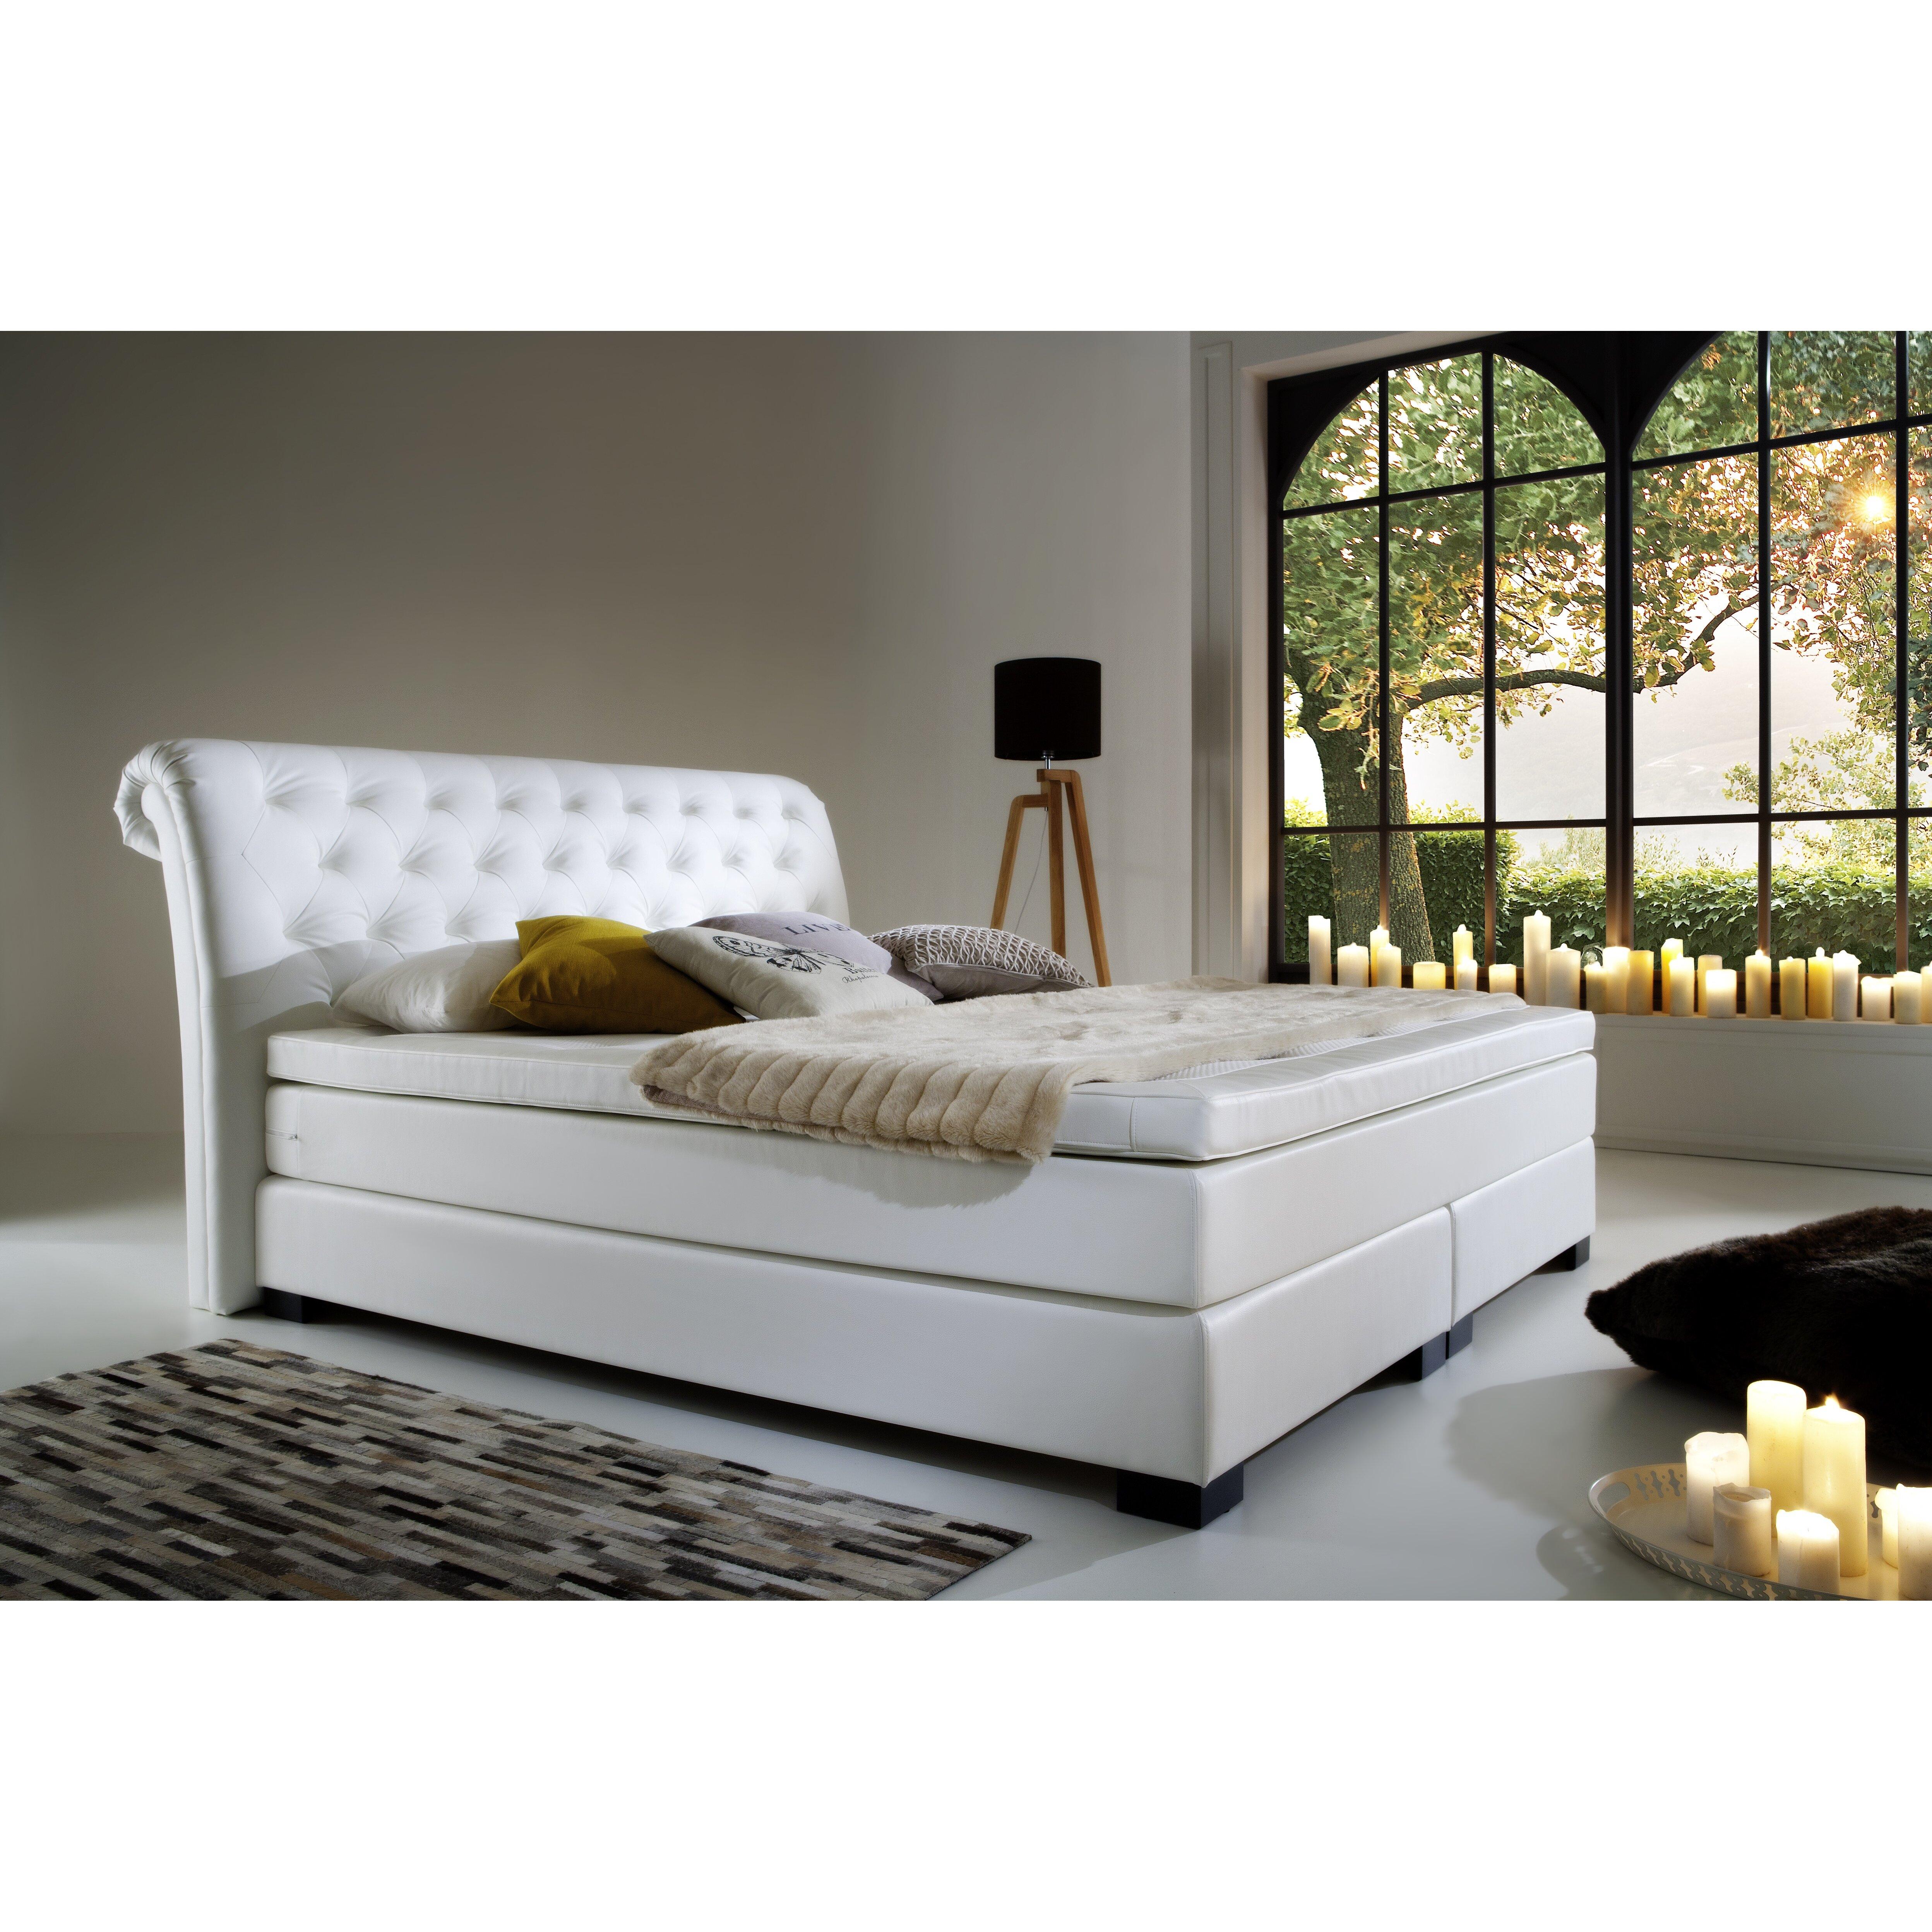 atlantic home collection boxspringbett molly mit topper. Black Bedroom Furniture Sets. Home Design Ideas